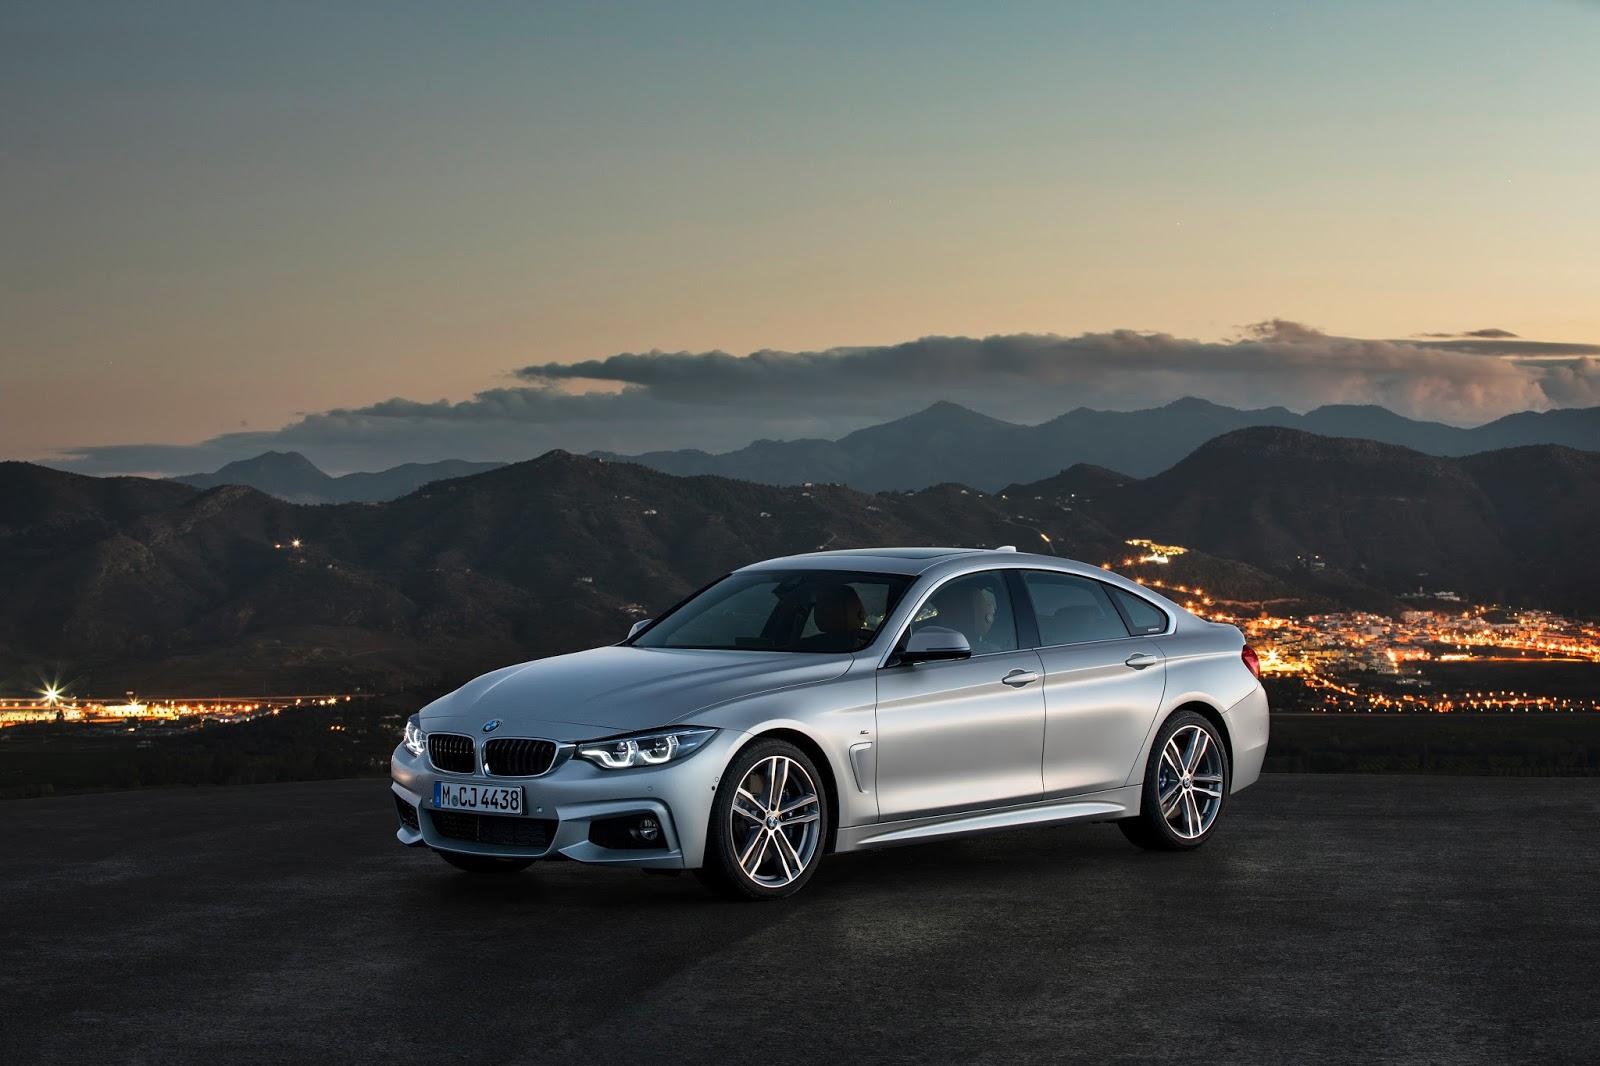 P90245282 highRes bmw 4 series m sport Η νέα BMW Σειρά 4, με πιο σφιχτή ρύθμιση ανάρτησης BMW, Bmw 4, BMW 4 Cabrio, BMW 4 Coupe, BMW 4 Gran Coupé, Facelift